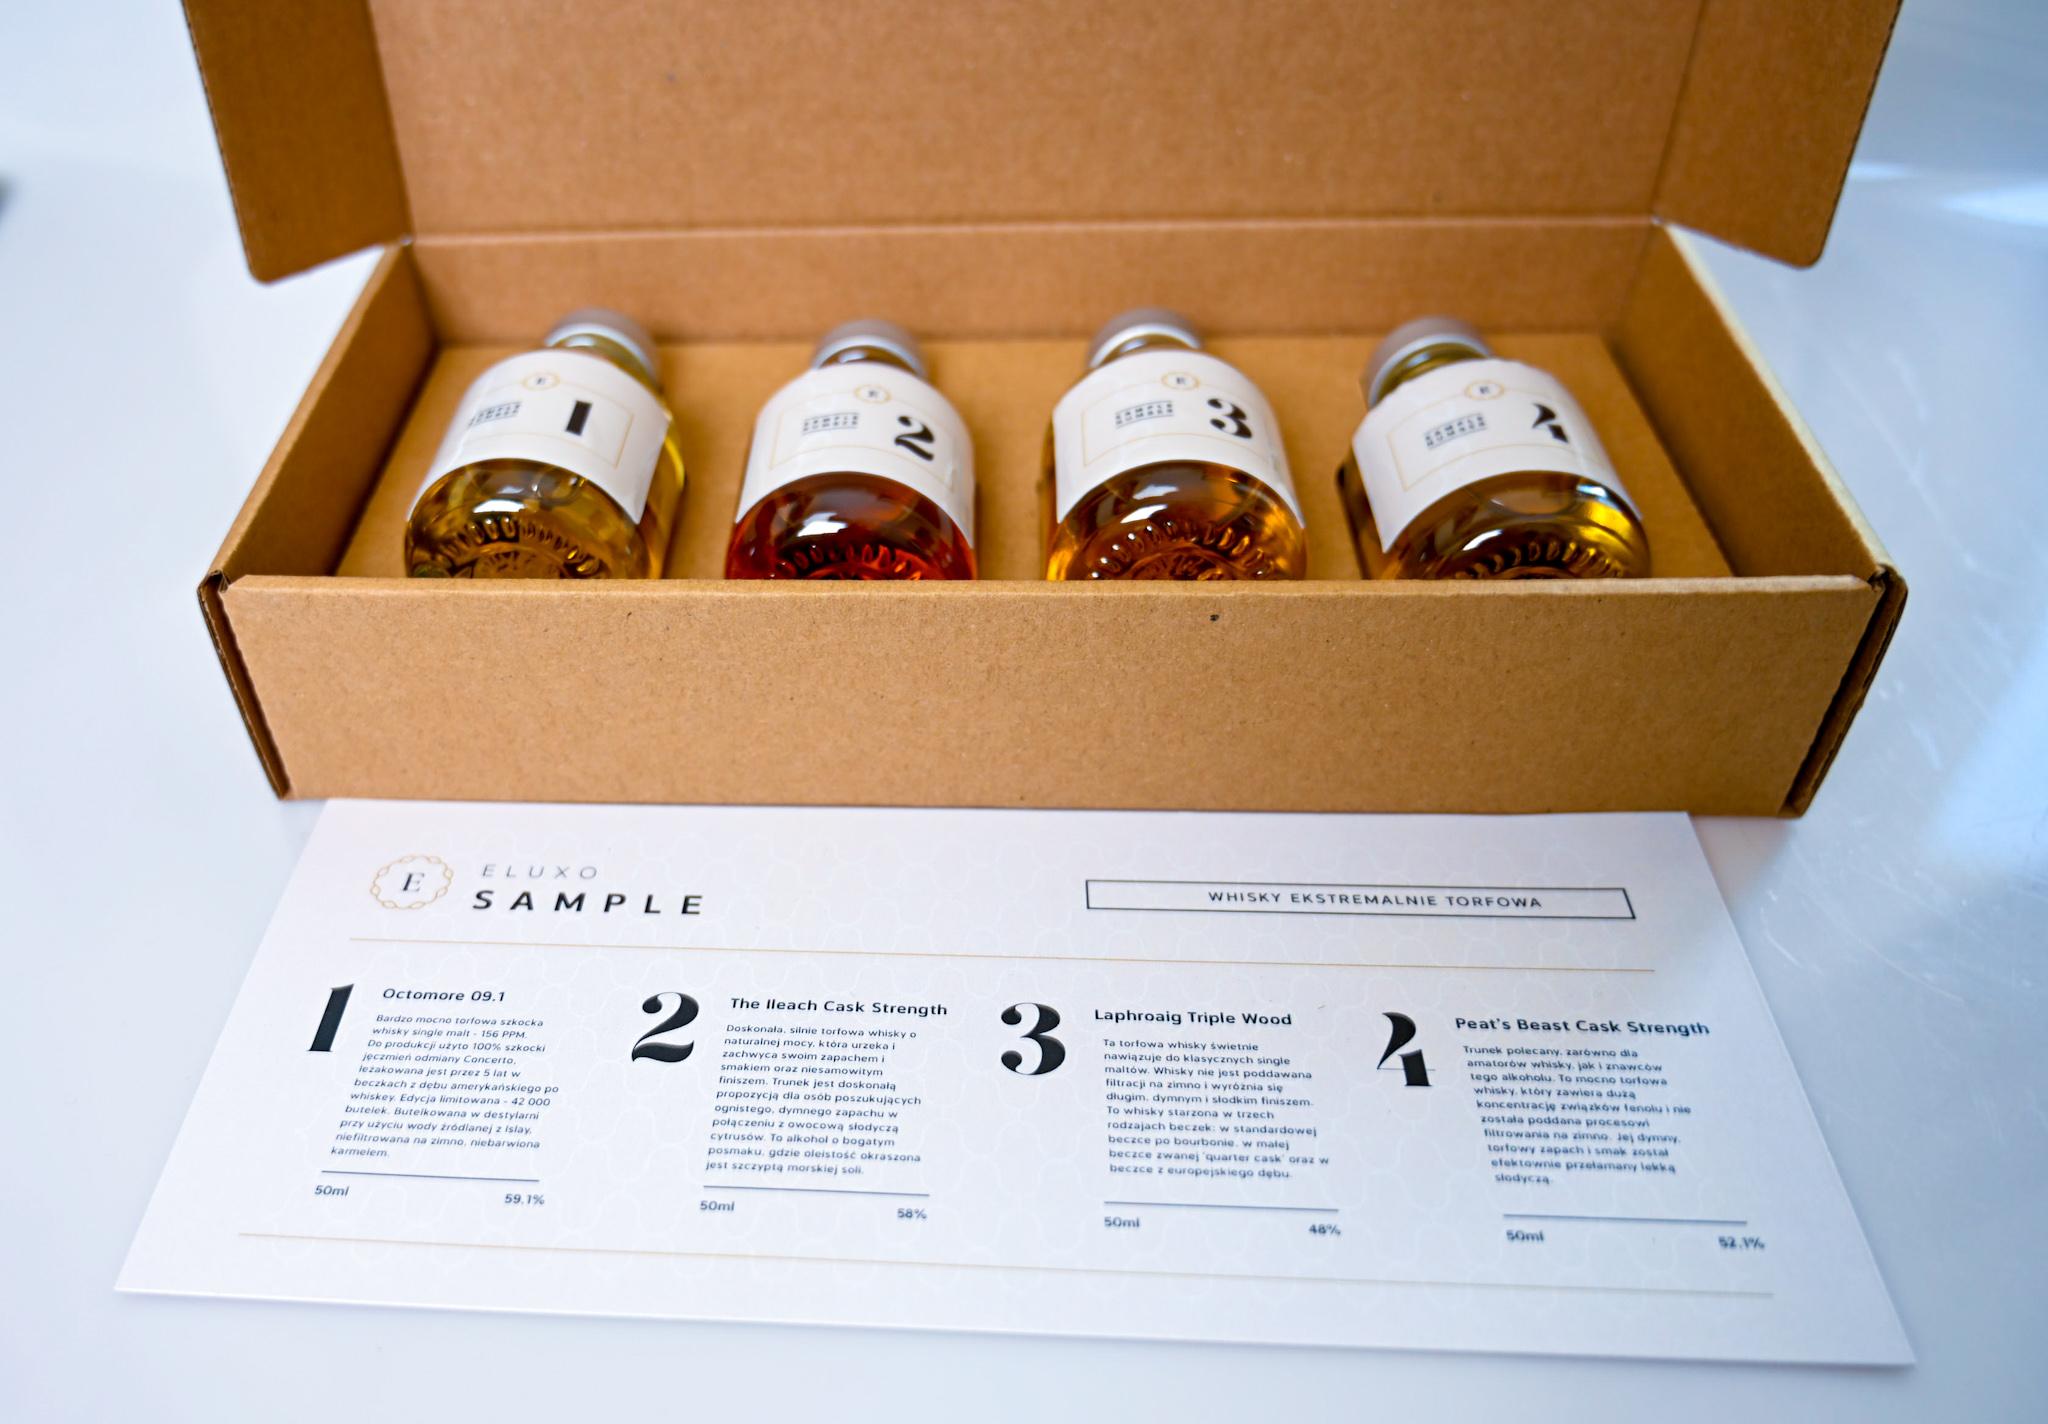 sample eluxo whisky ekstremalnie torfowa